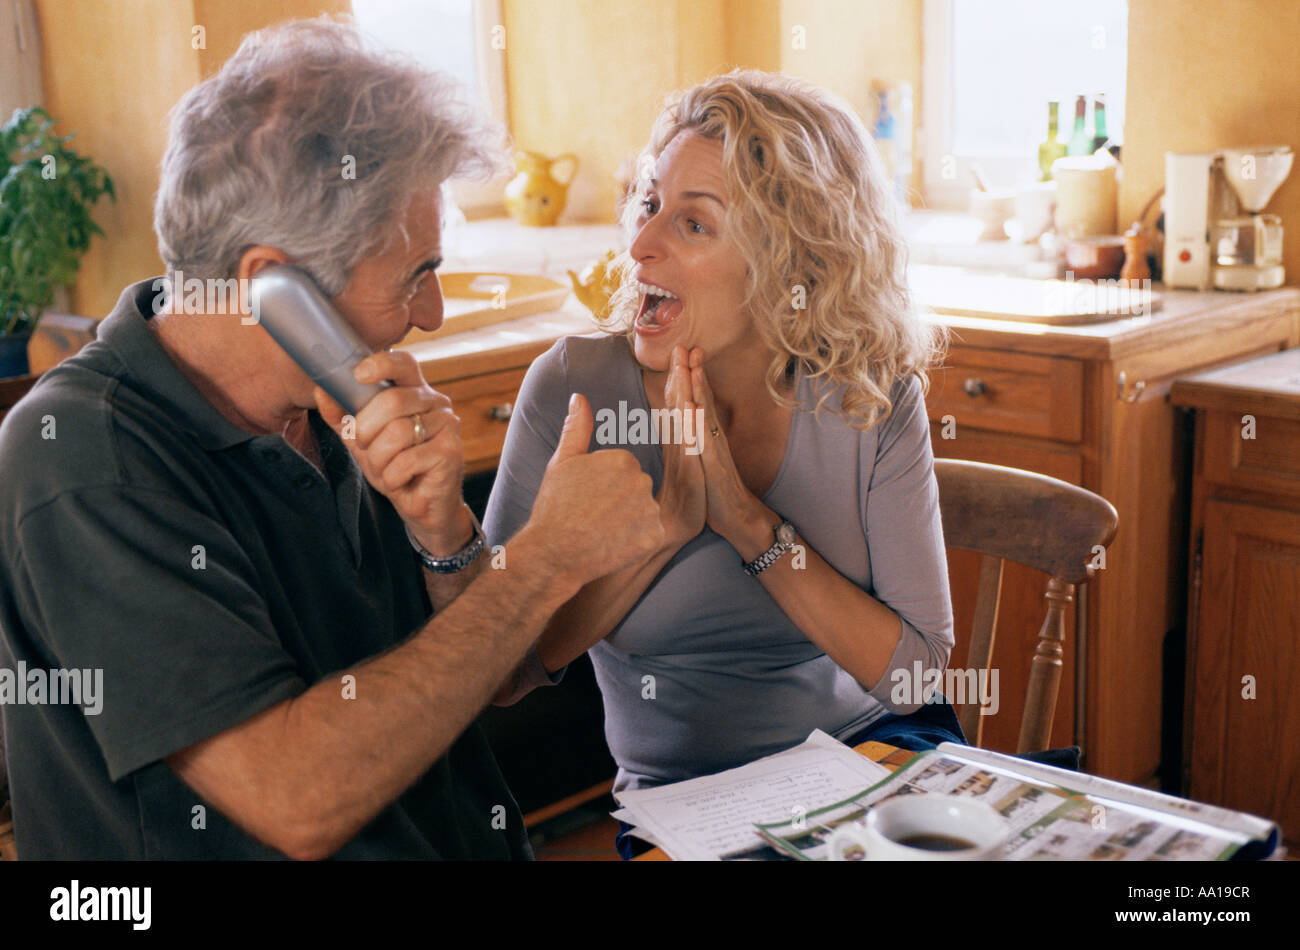 Couple getting good news - Stock Image